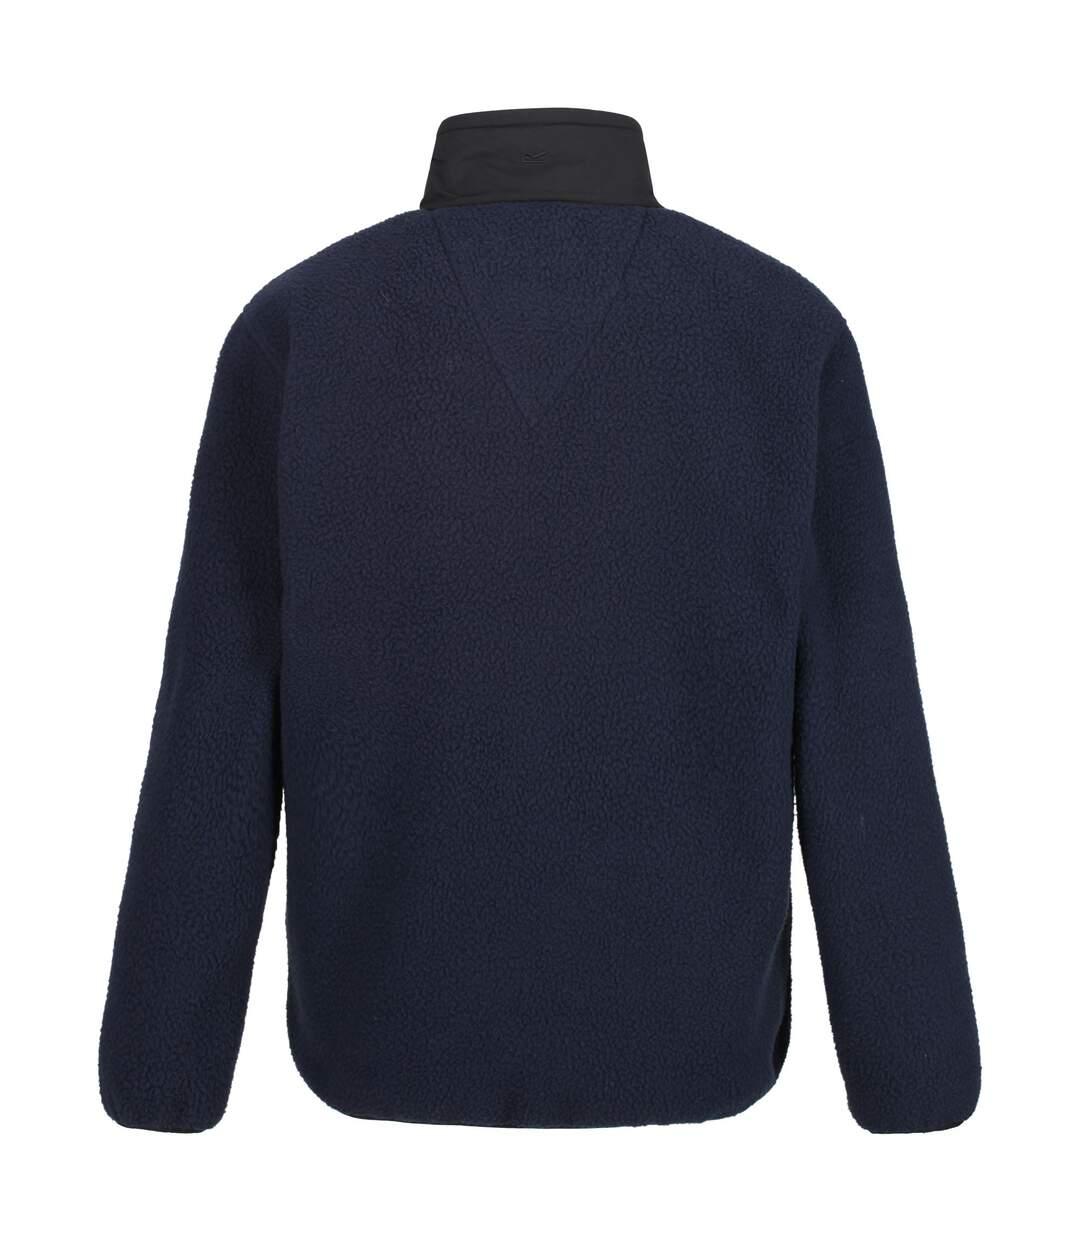 Regatta - Veste polaire CAYO - Homme (Bleu marine / noir) - UTRG4599